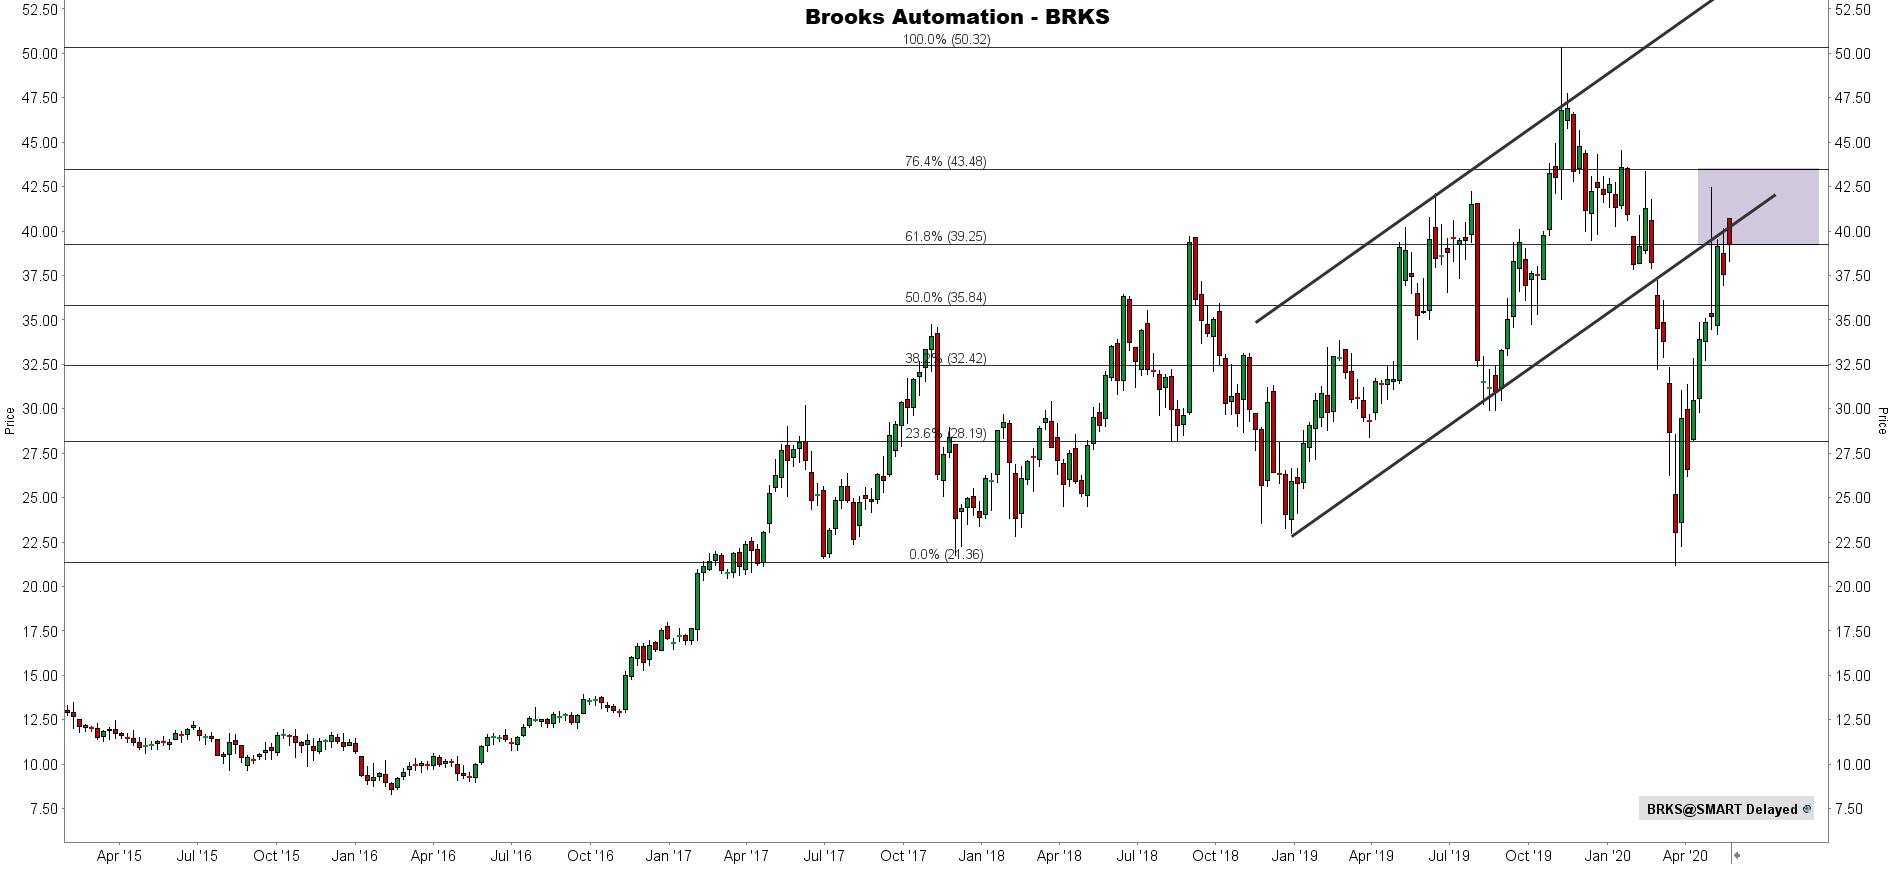 Robotica aandeel Brooks automation technische analyse